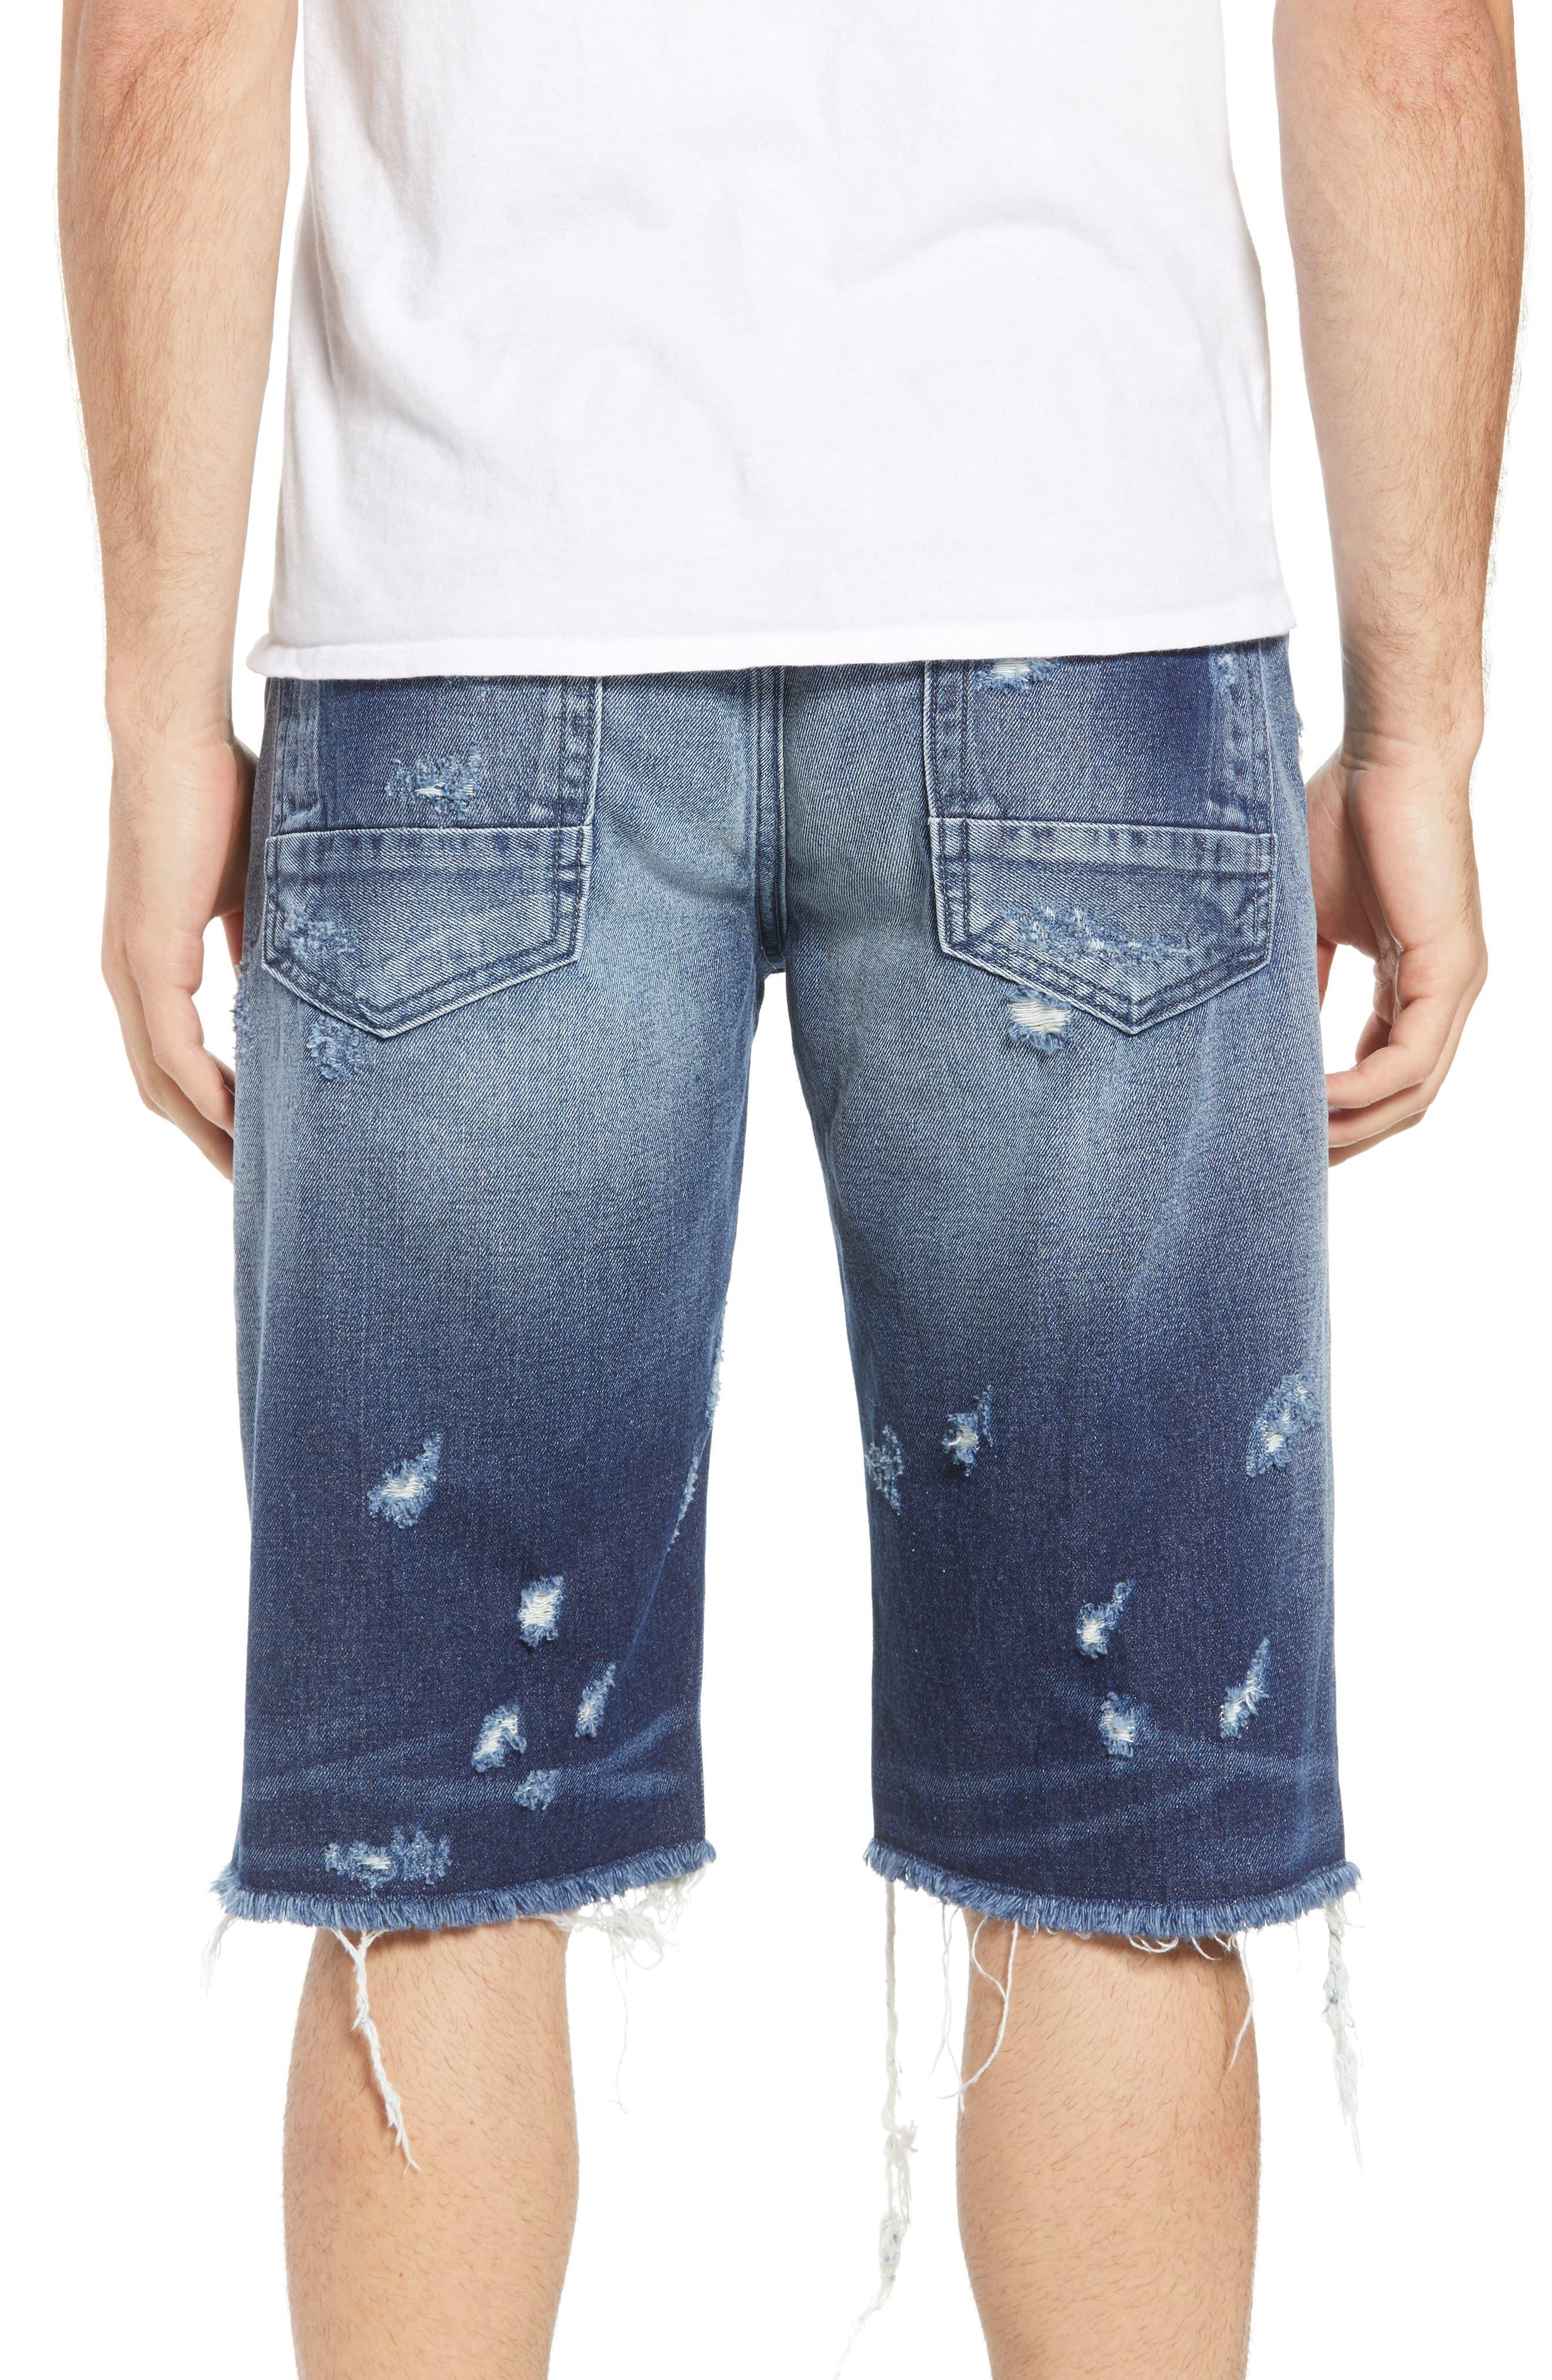 Challenger Regular Fit Shorts,                             Alternate thumbnail 2, color,                             Nimble